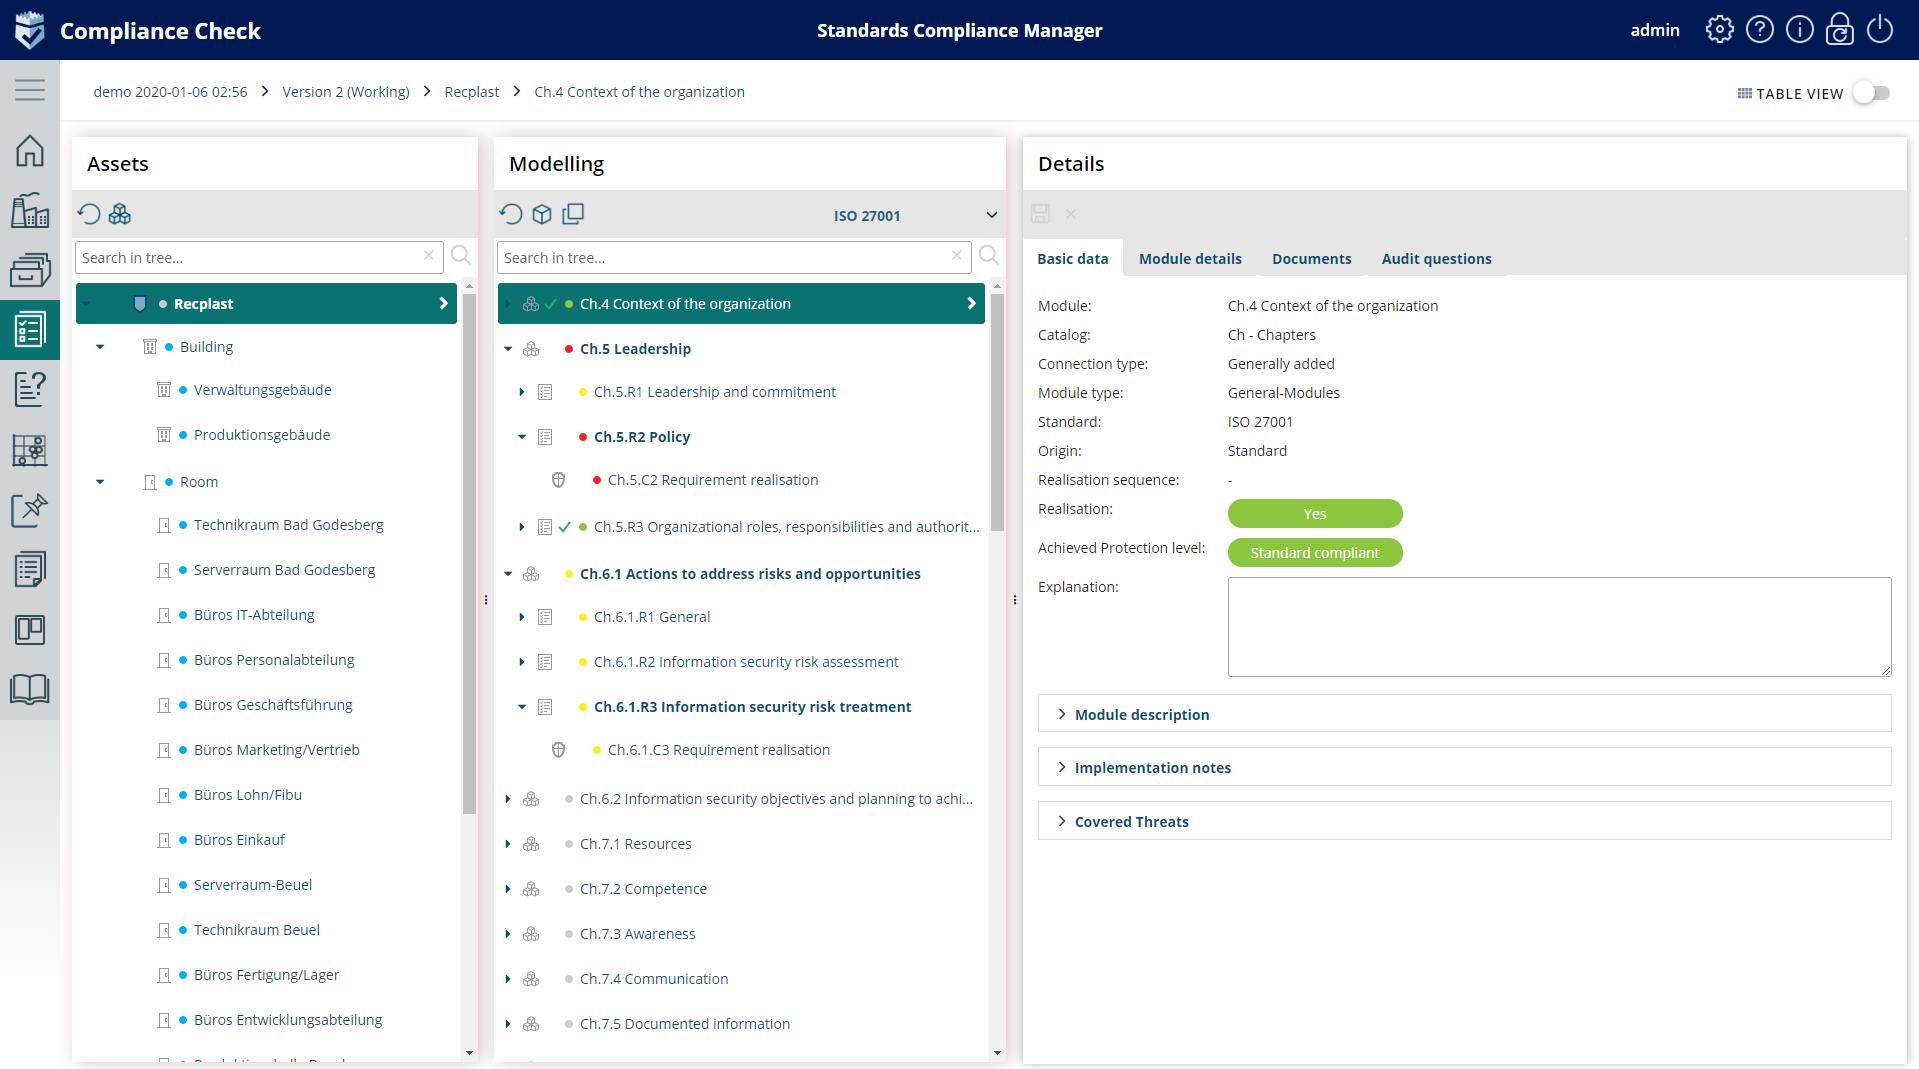 Infopulse SCM Compliance Check